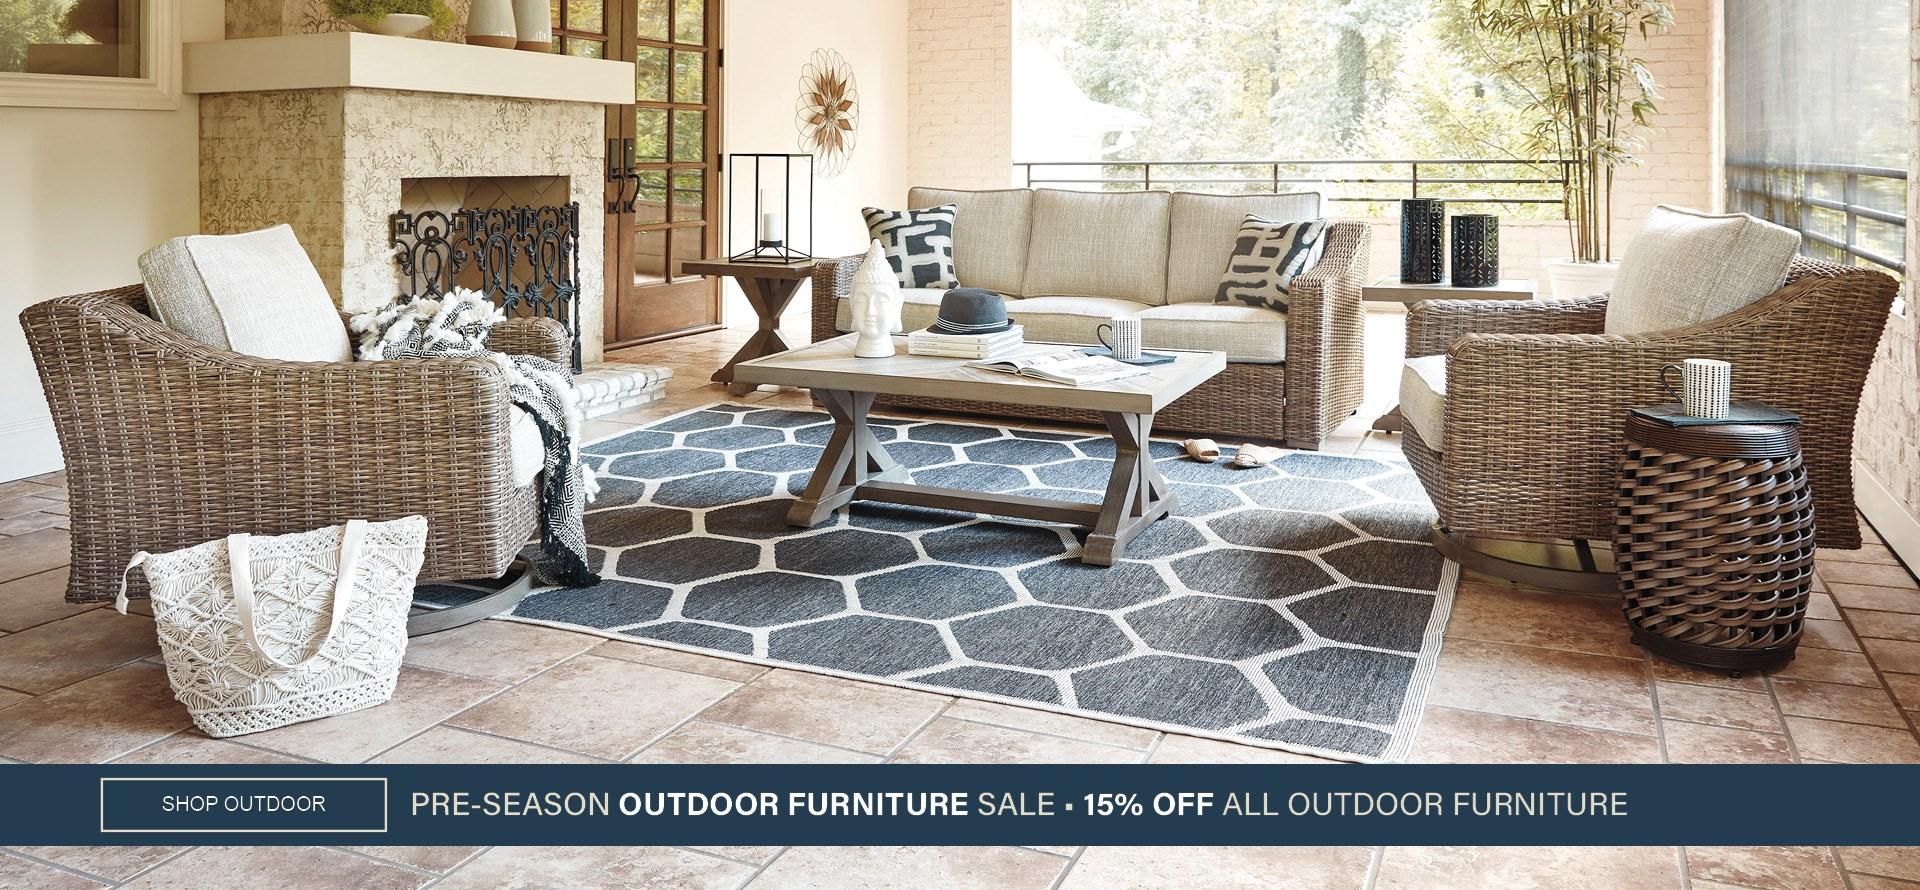 Pre-Season Outdoor Furniture Sale